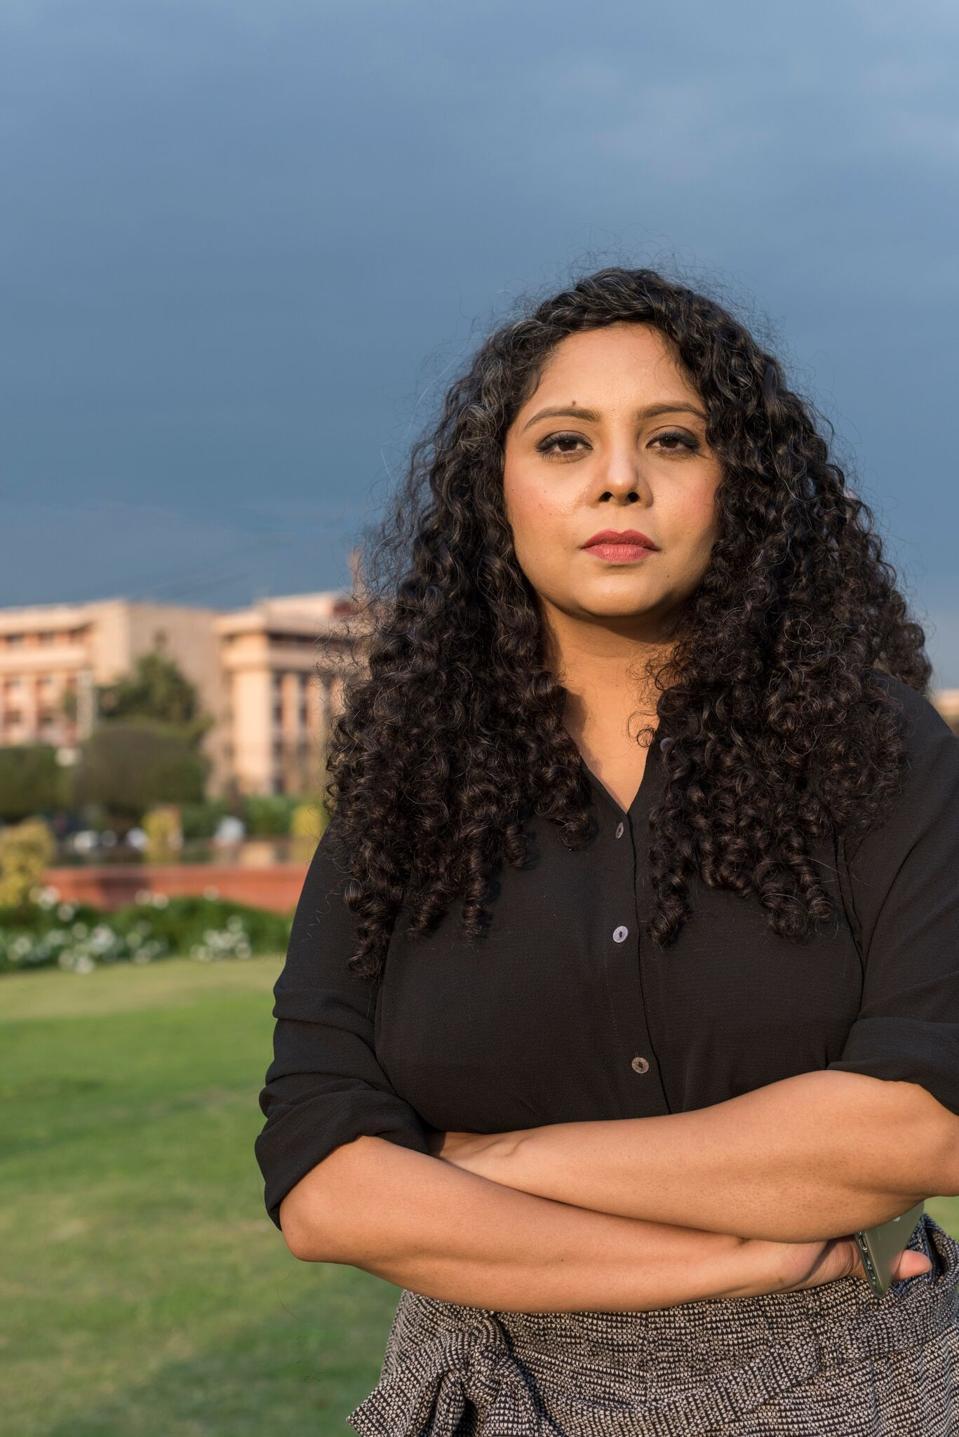 Journalist Rana Ayyub